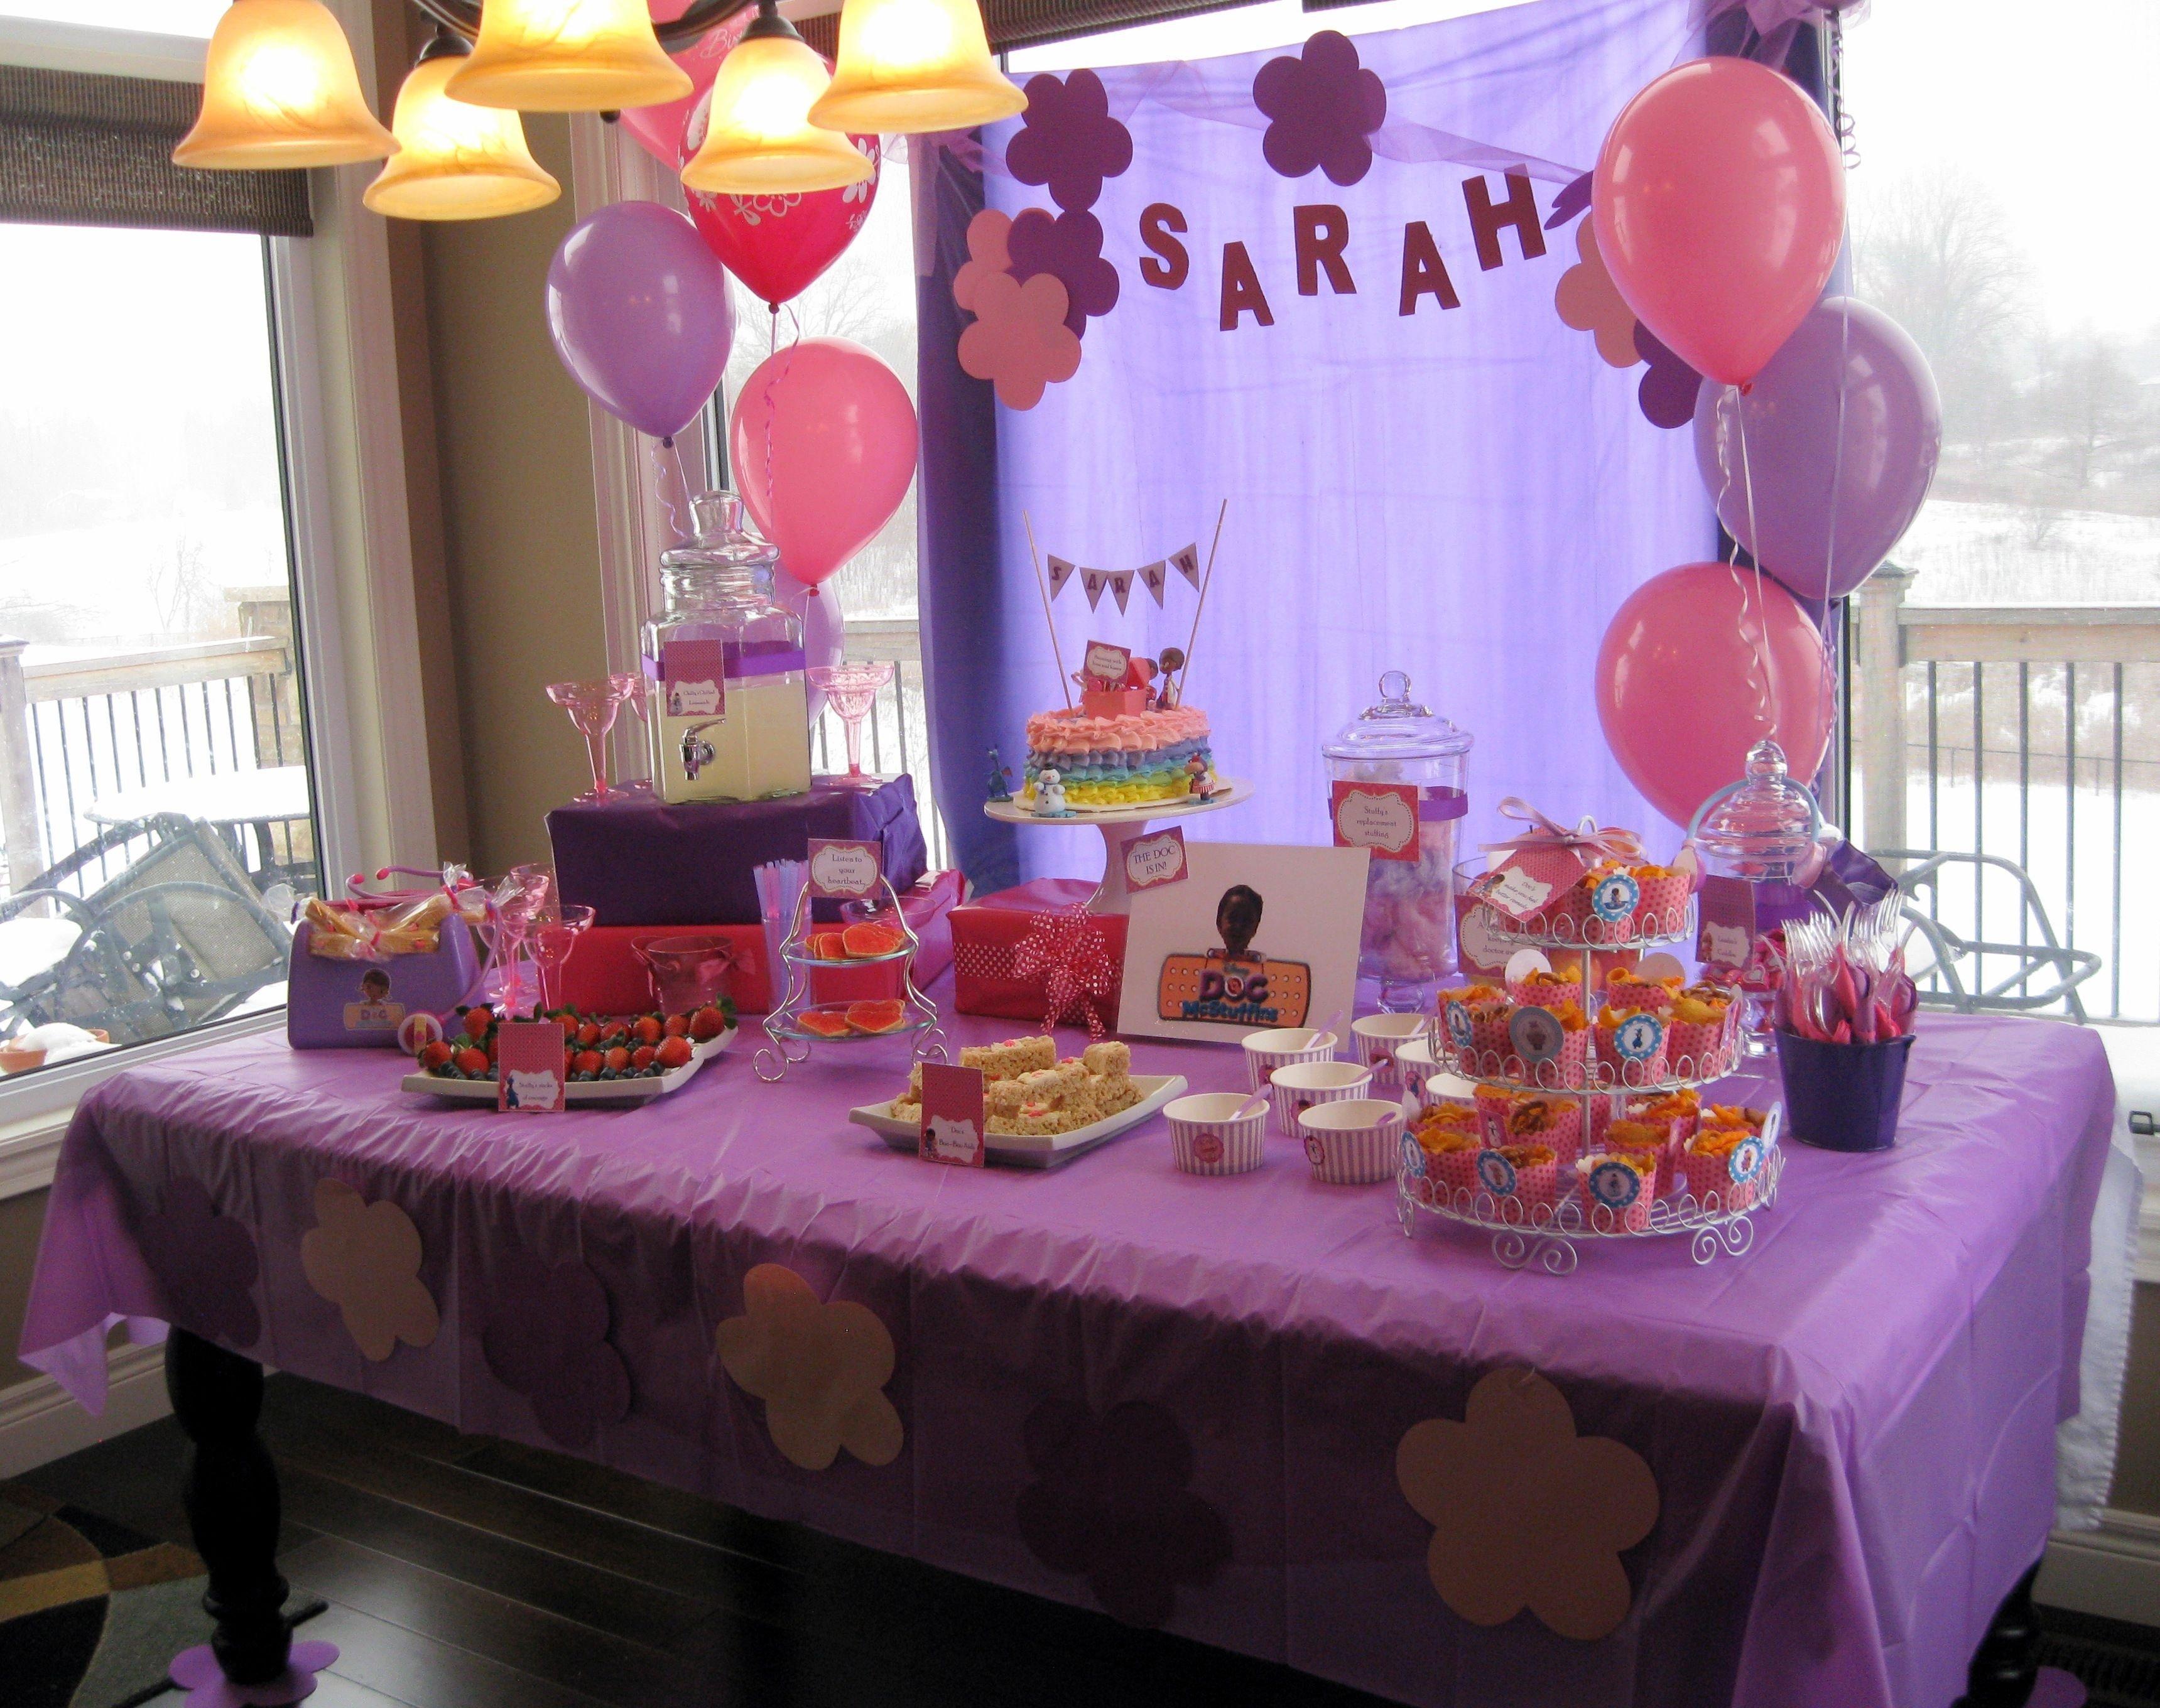 10 Spectacular Doc Mcstuffin Birthday Party Ideas doc mcstuffins birthday party table decor kyndalls 3rd birthday